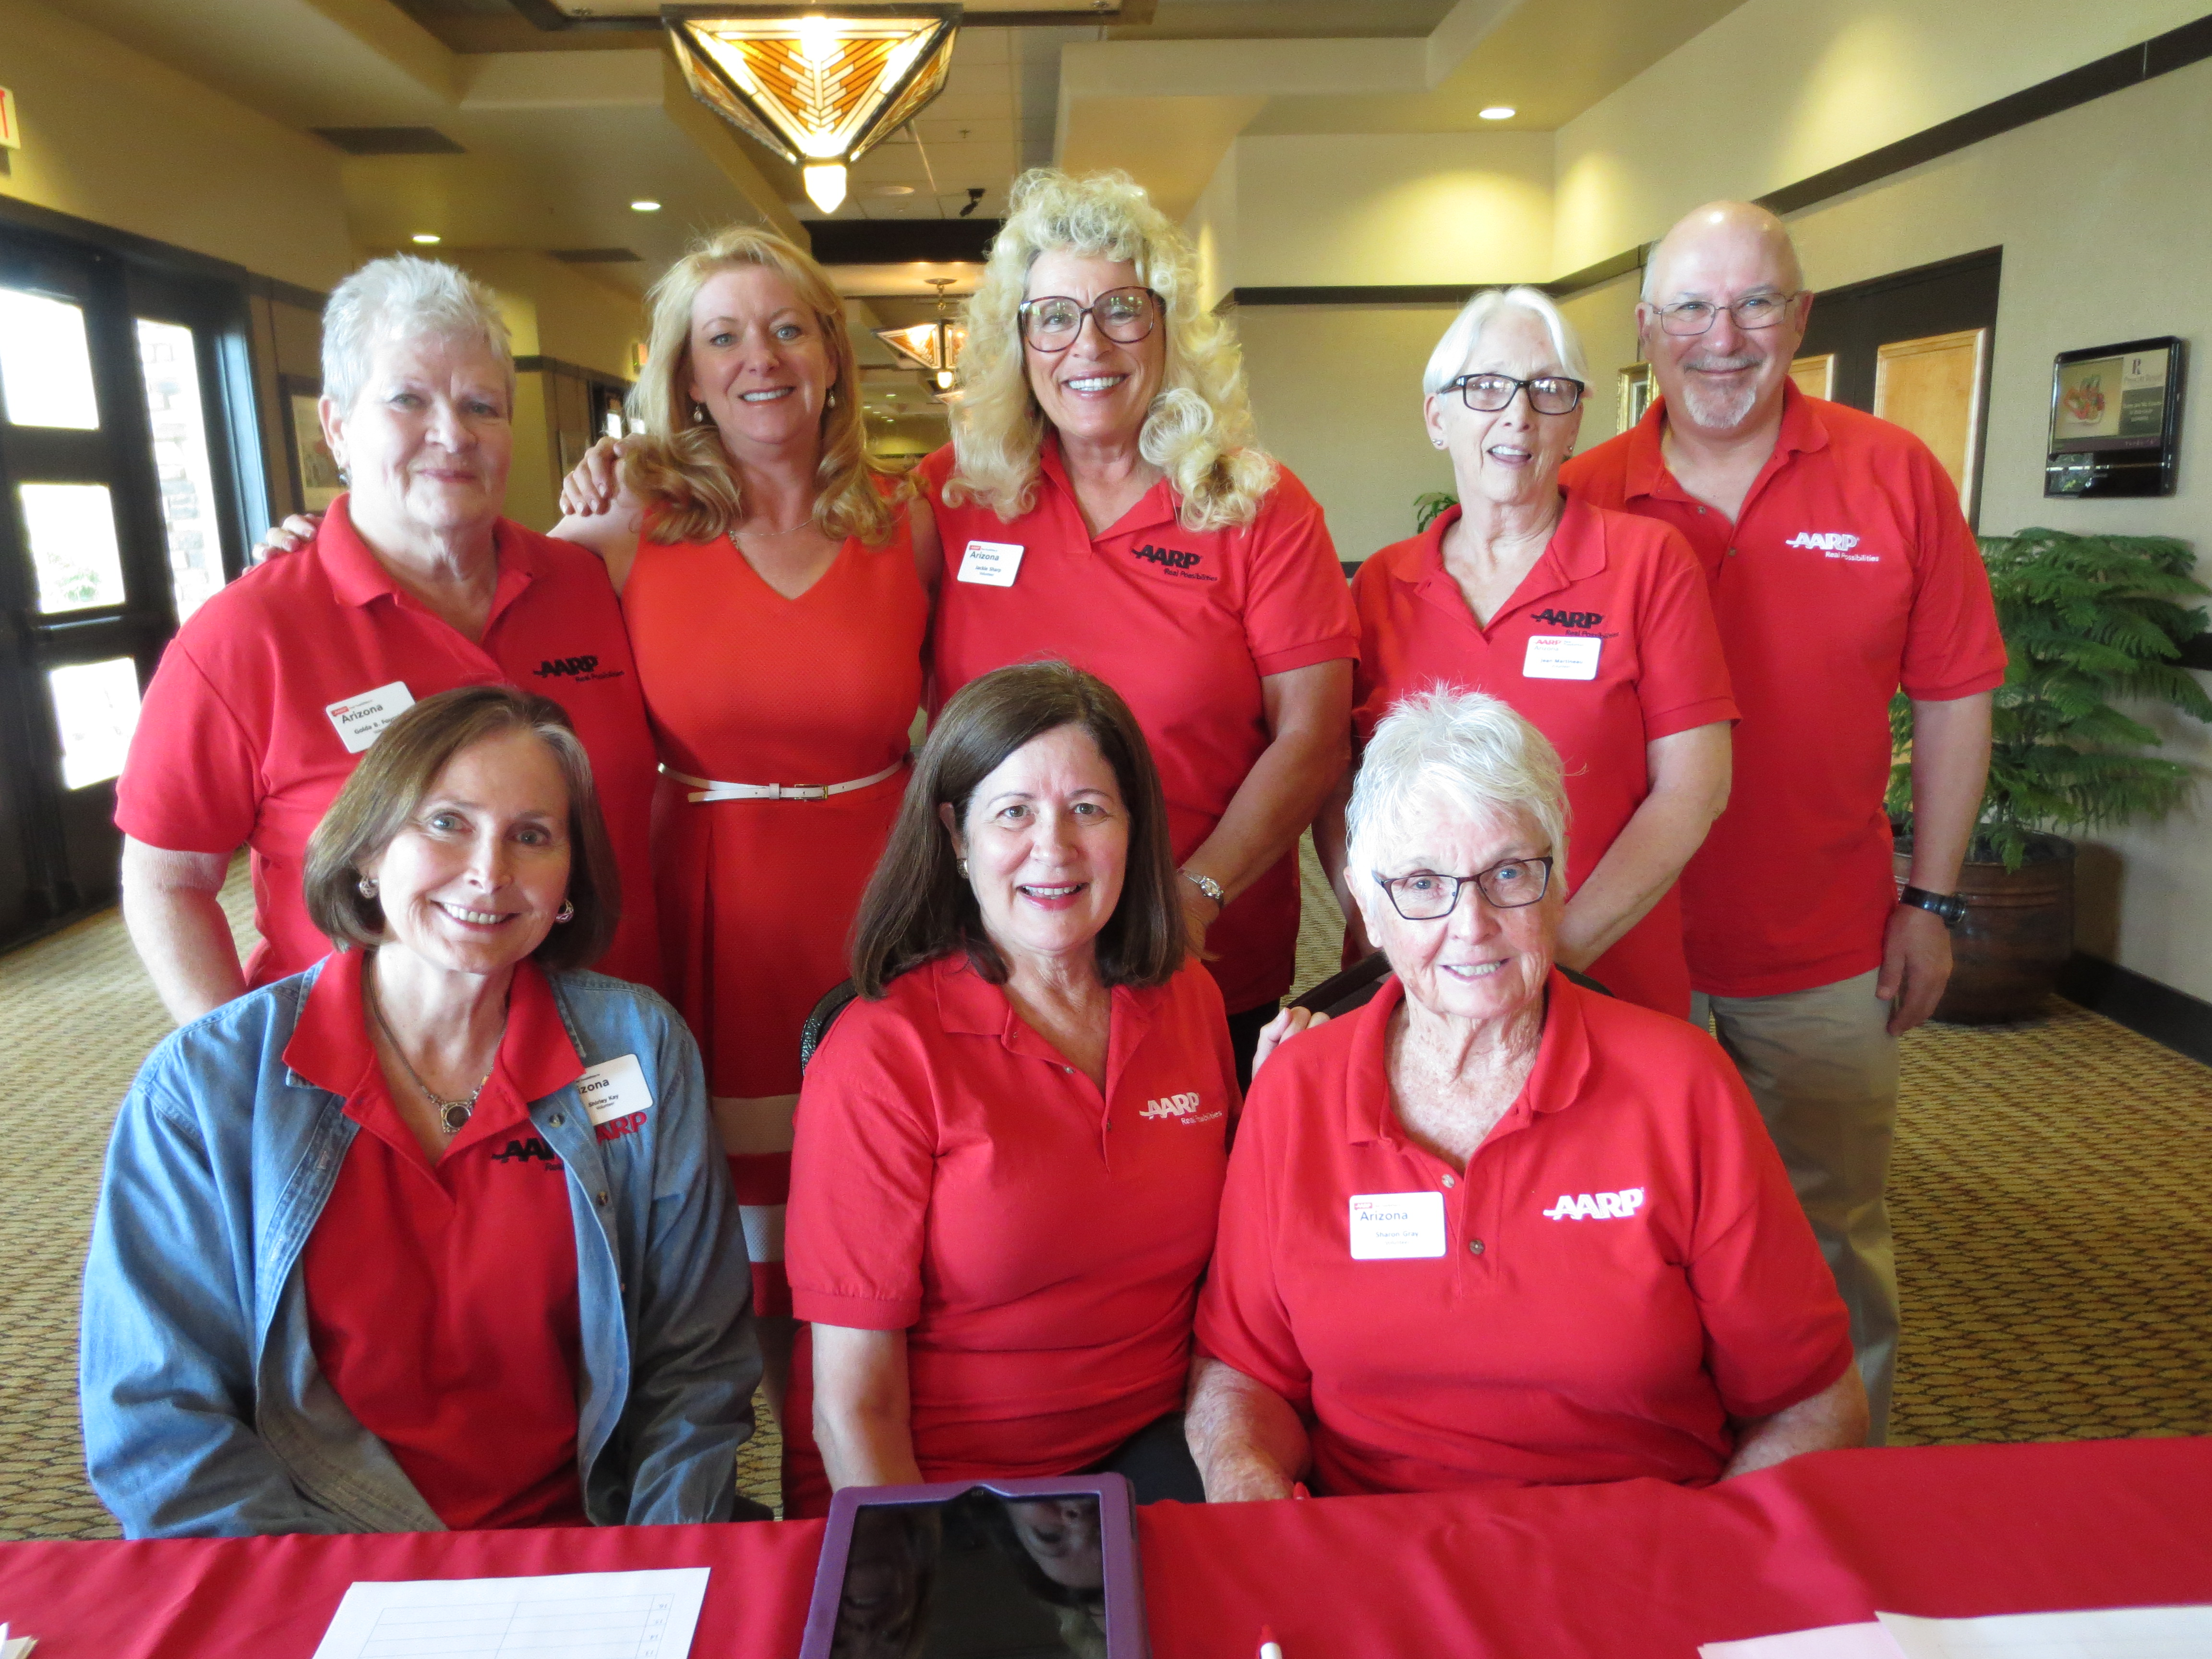 Volunteers at event